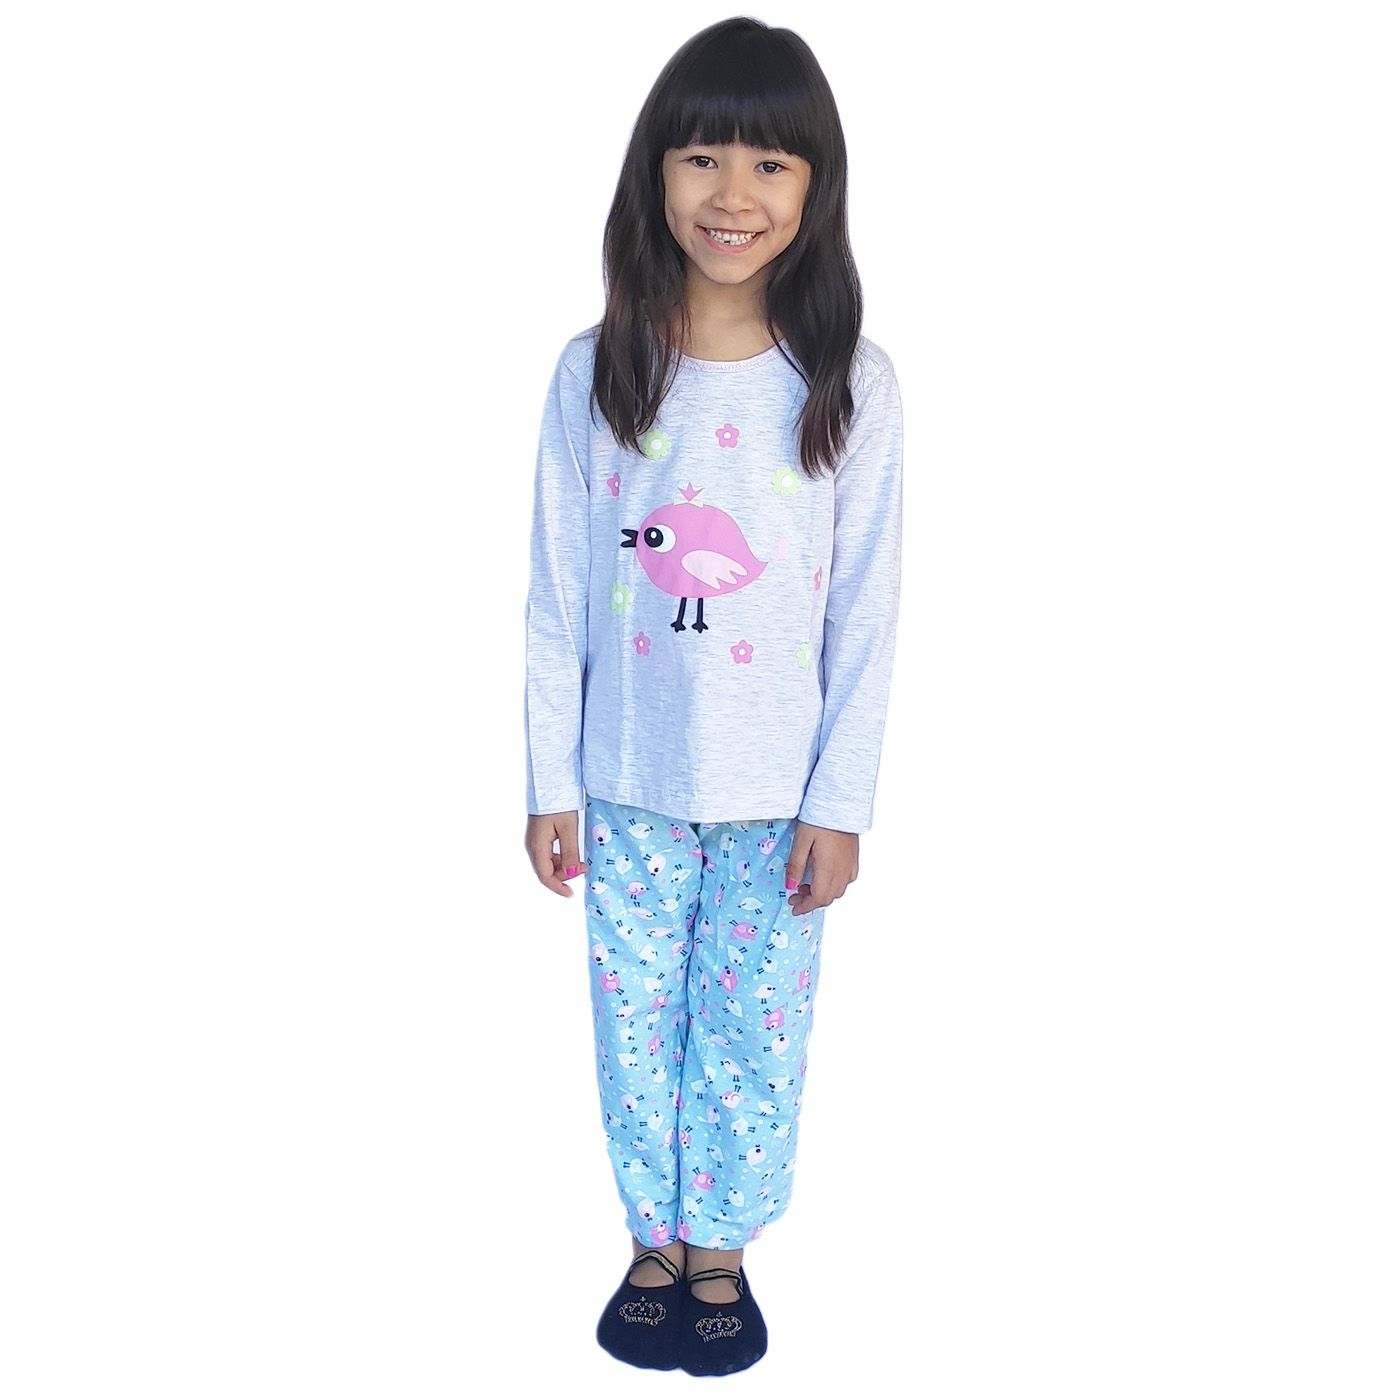 Pijama infantil menina frio manga longa algodão bichinho